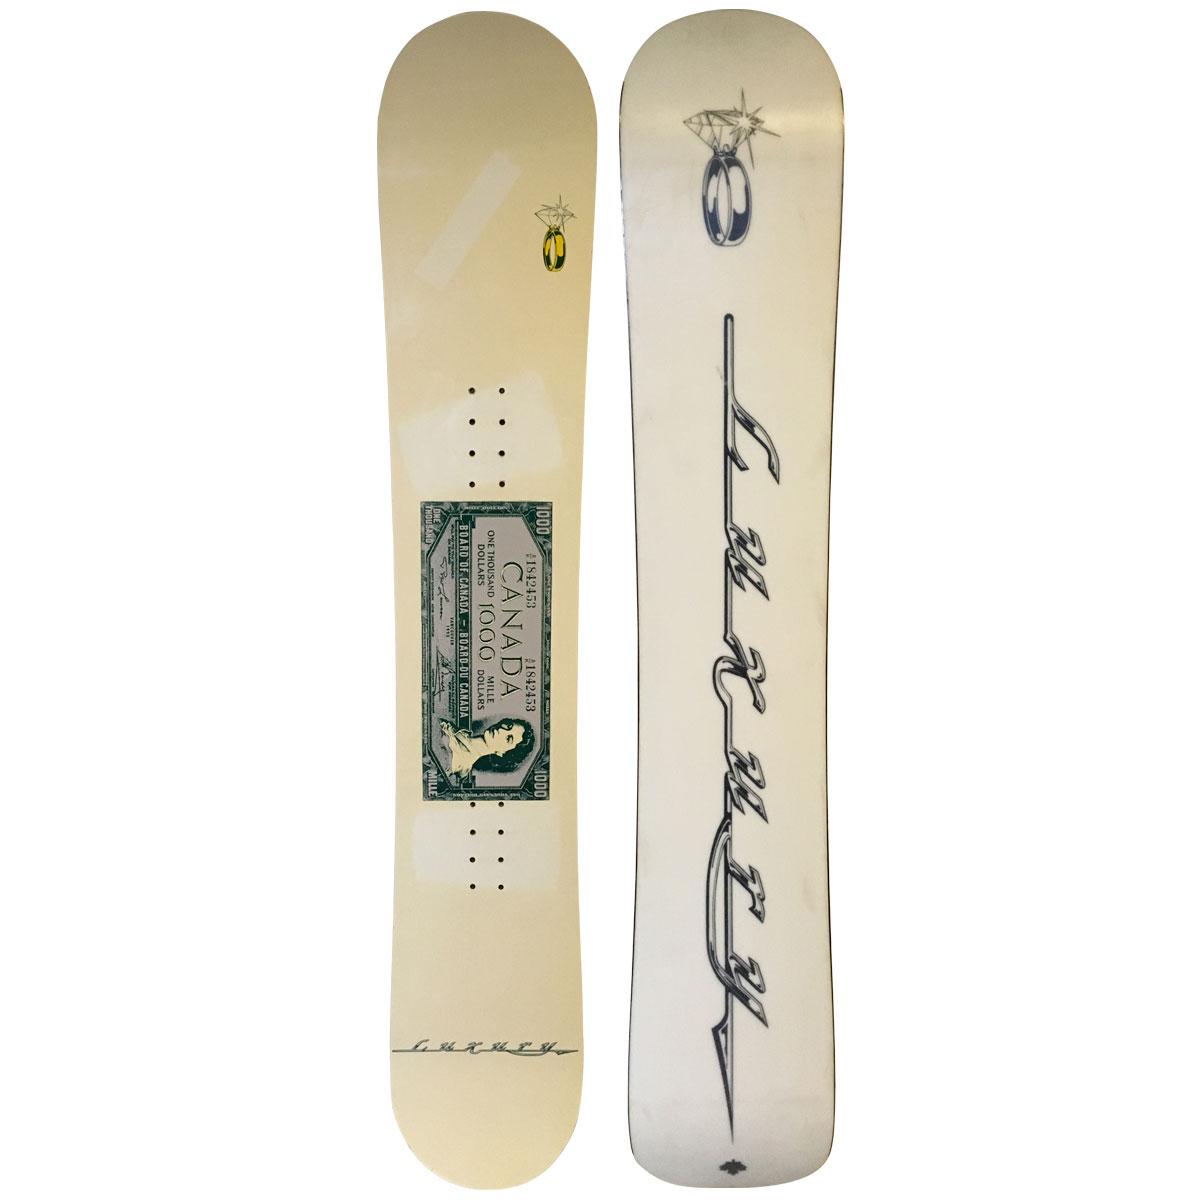 Luxury Snowboards